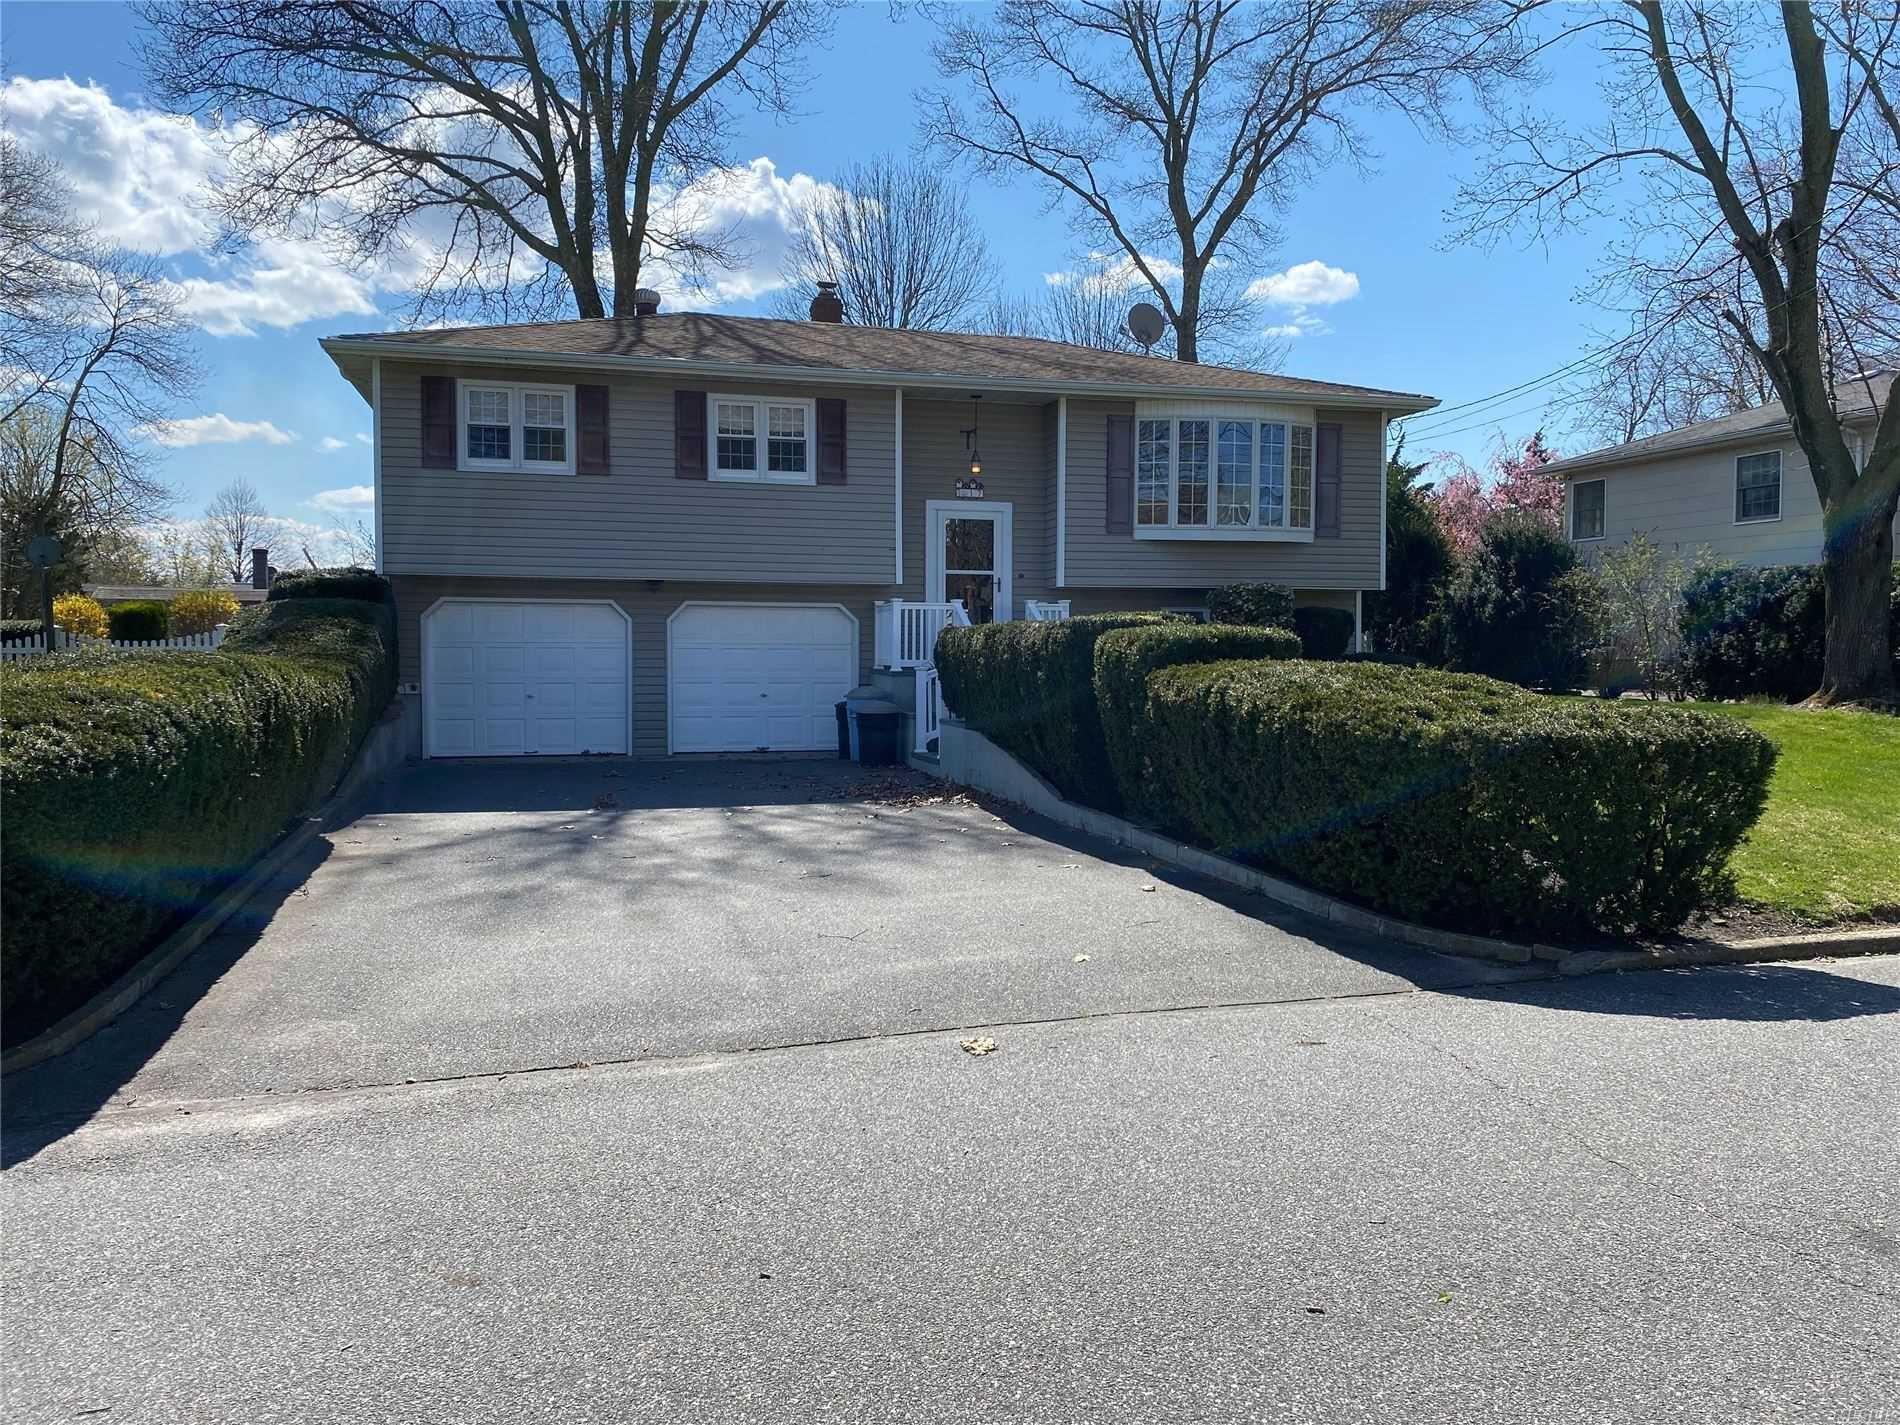 17 Joyce Drive, Riverhead, NY 11901 - MLS#: 3209196